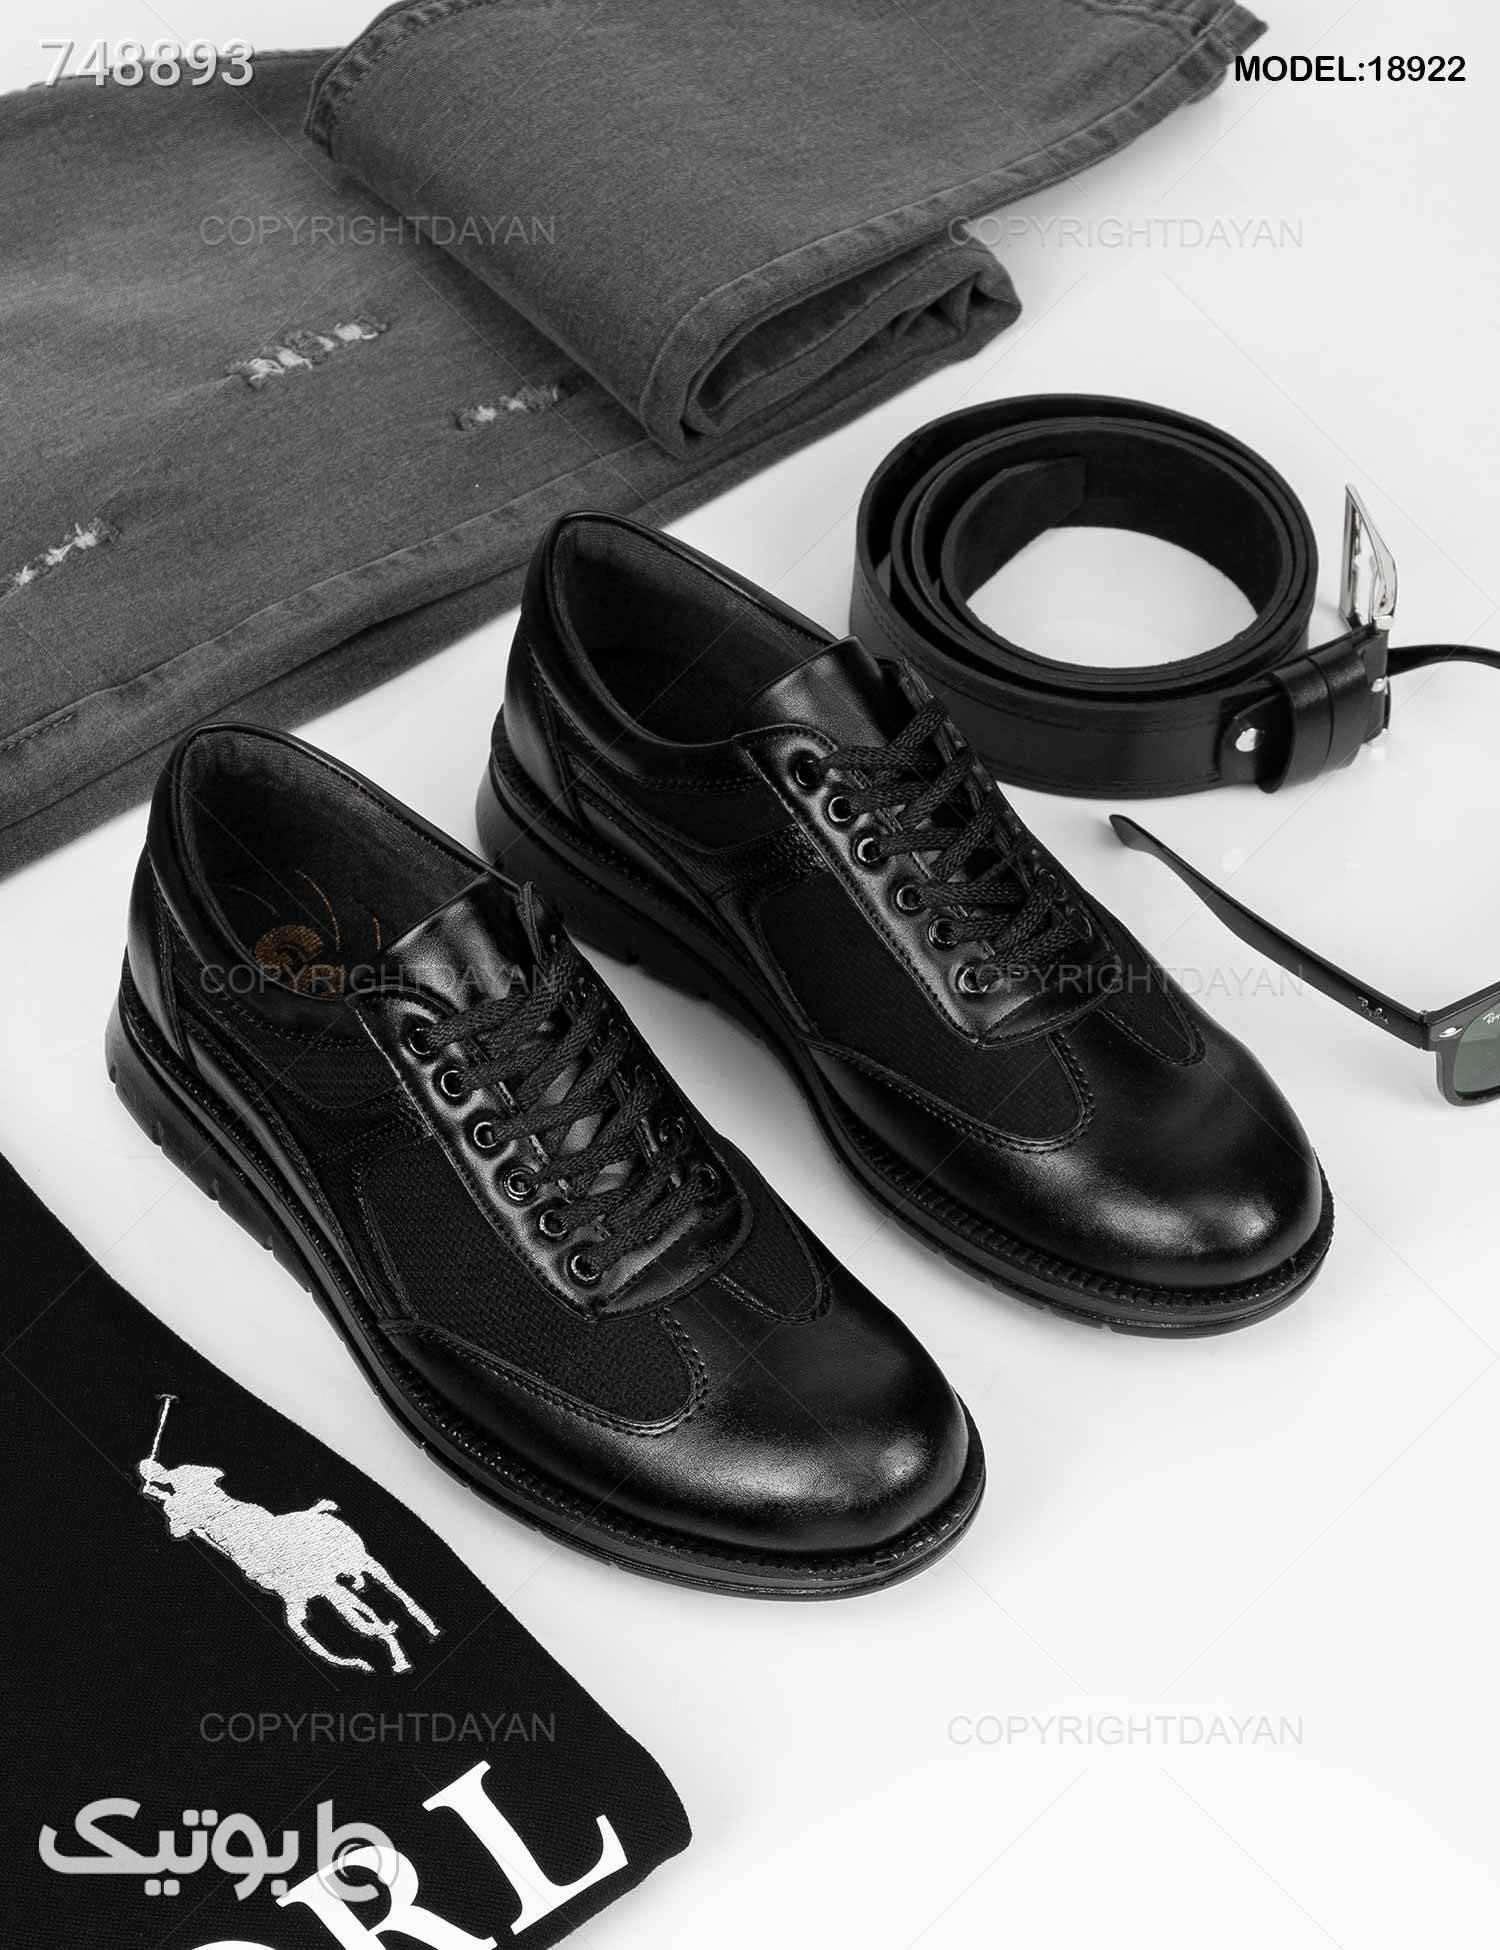 کفش مردانه Maran مدل 18922 مشکی كفش مردانه